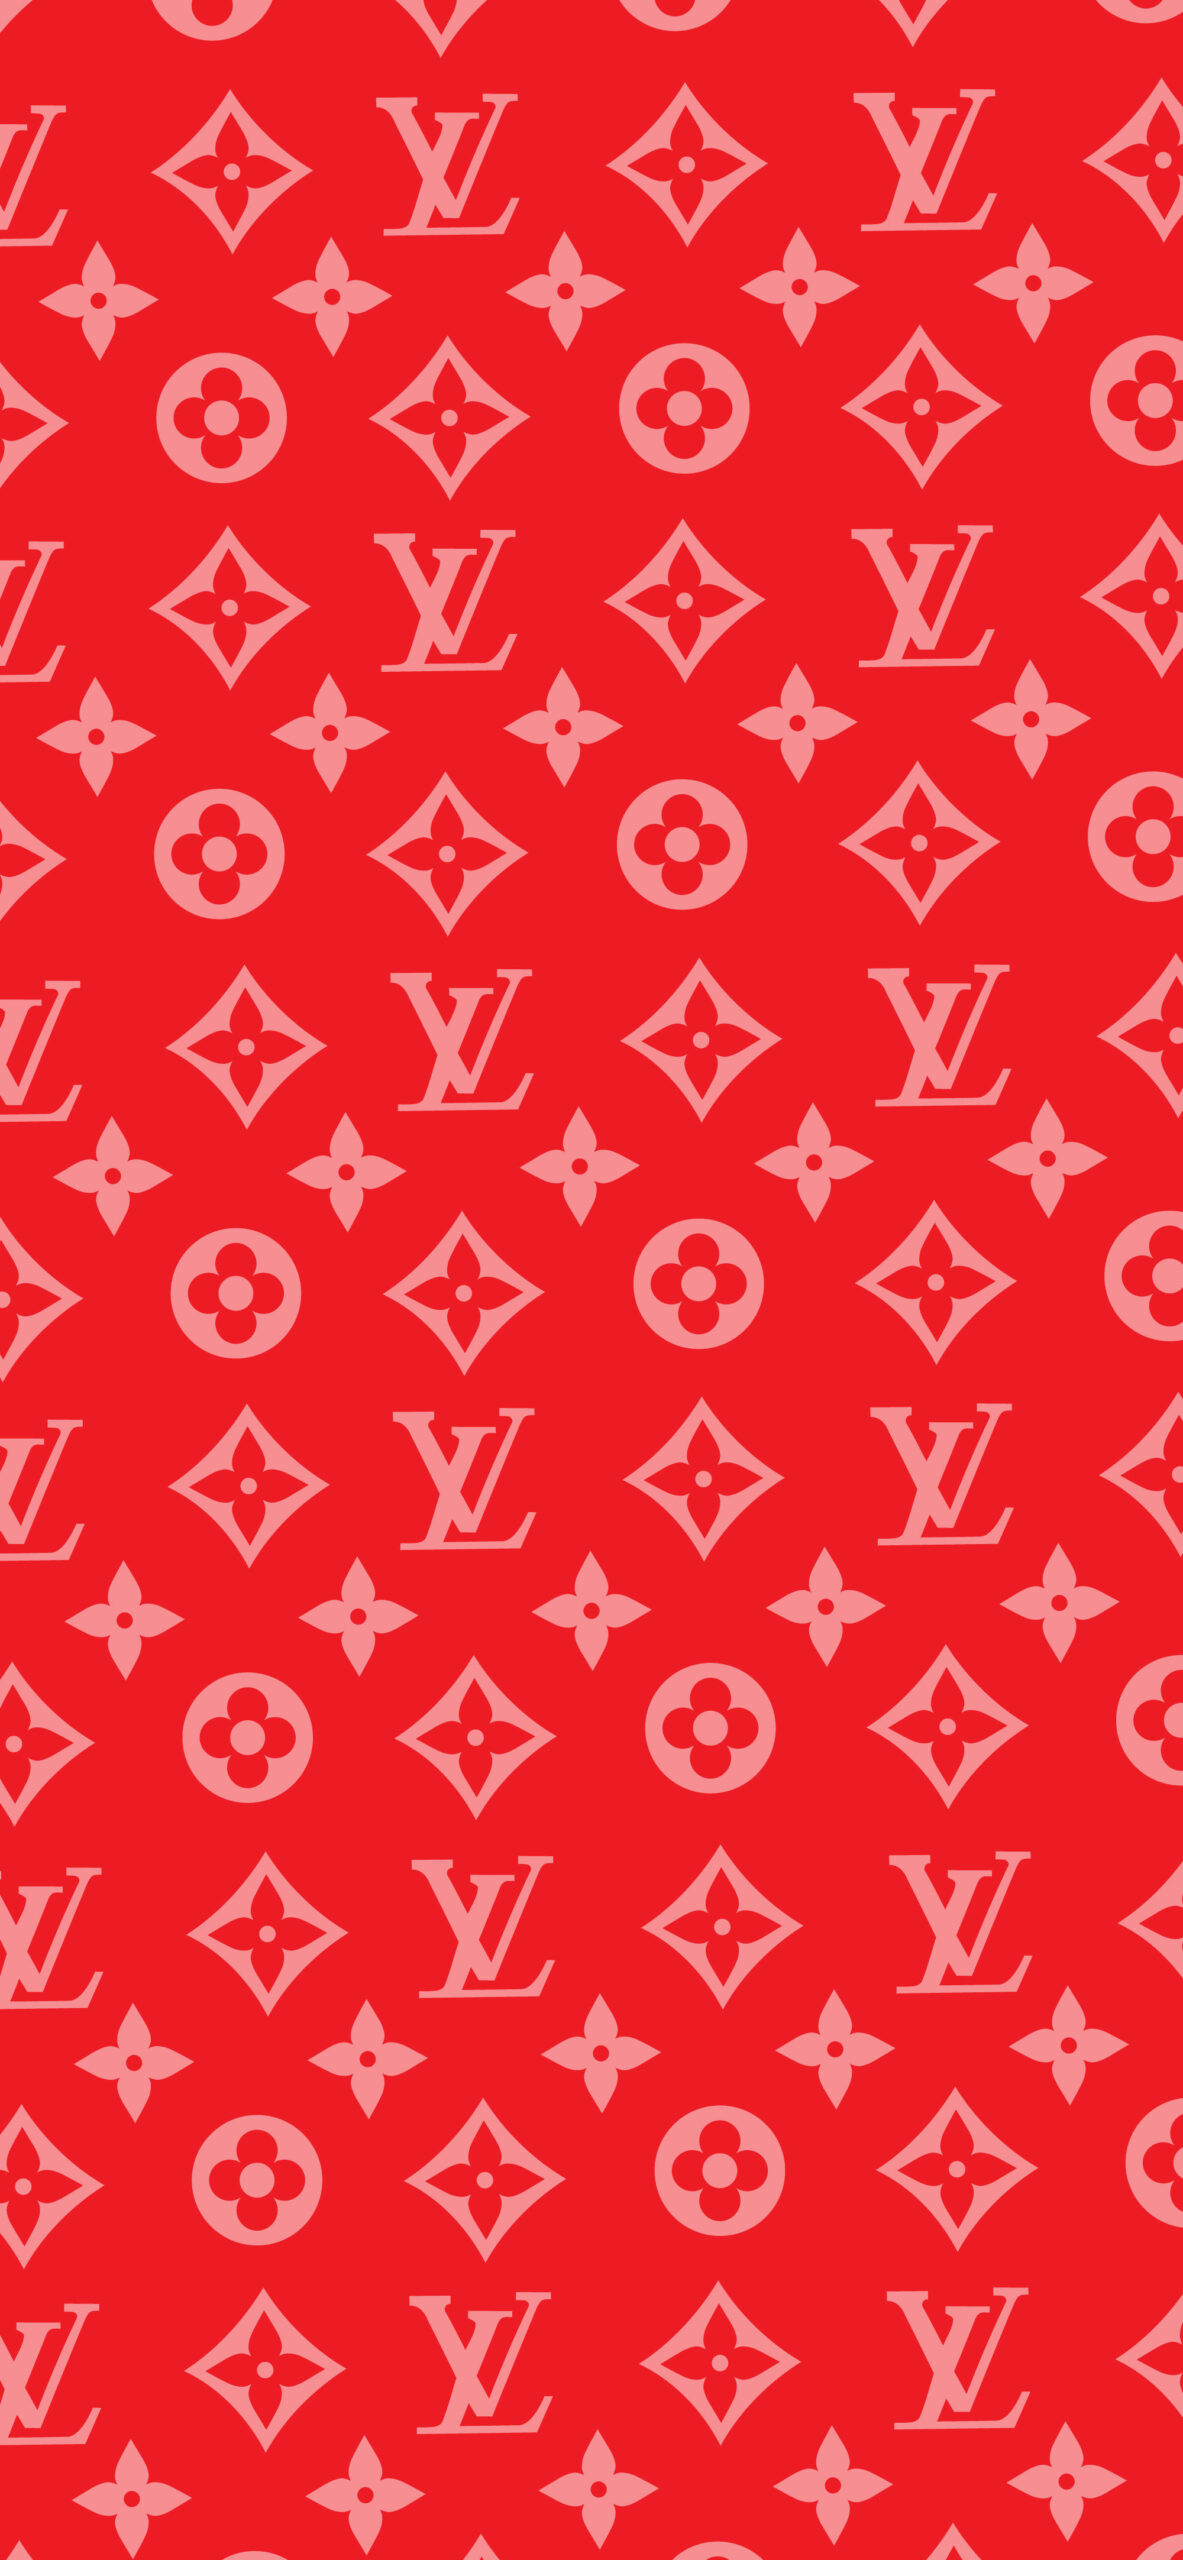 supreme louis vuitton red background